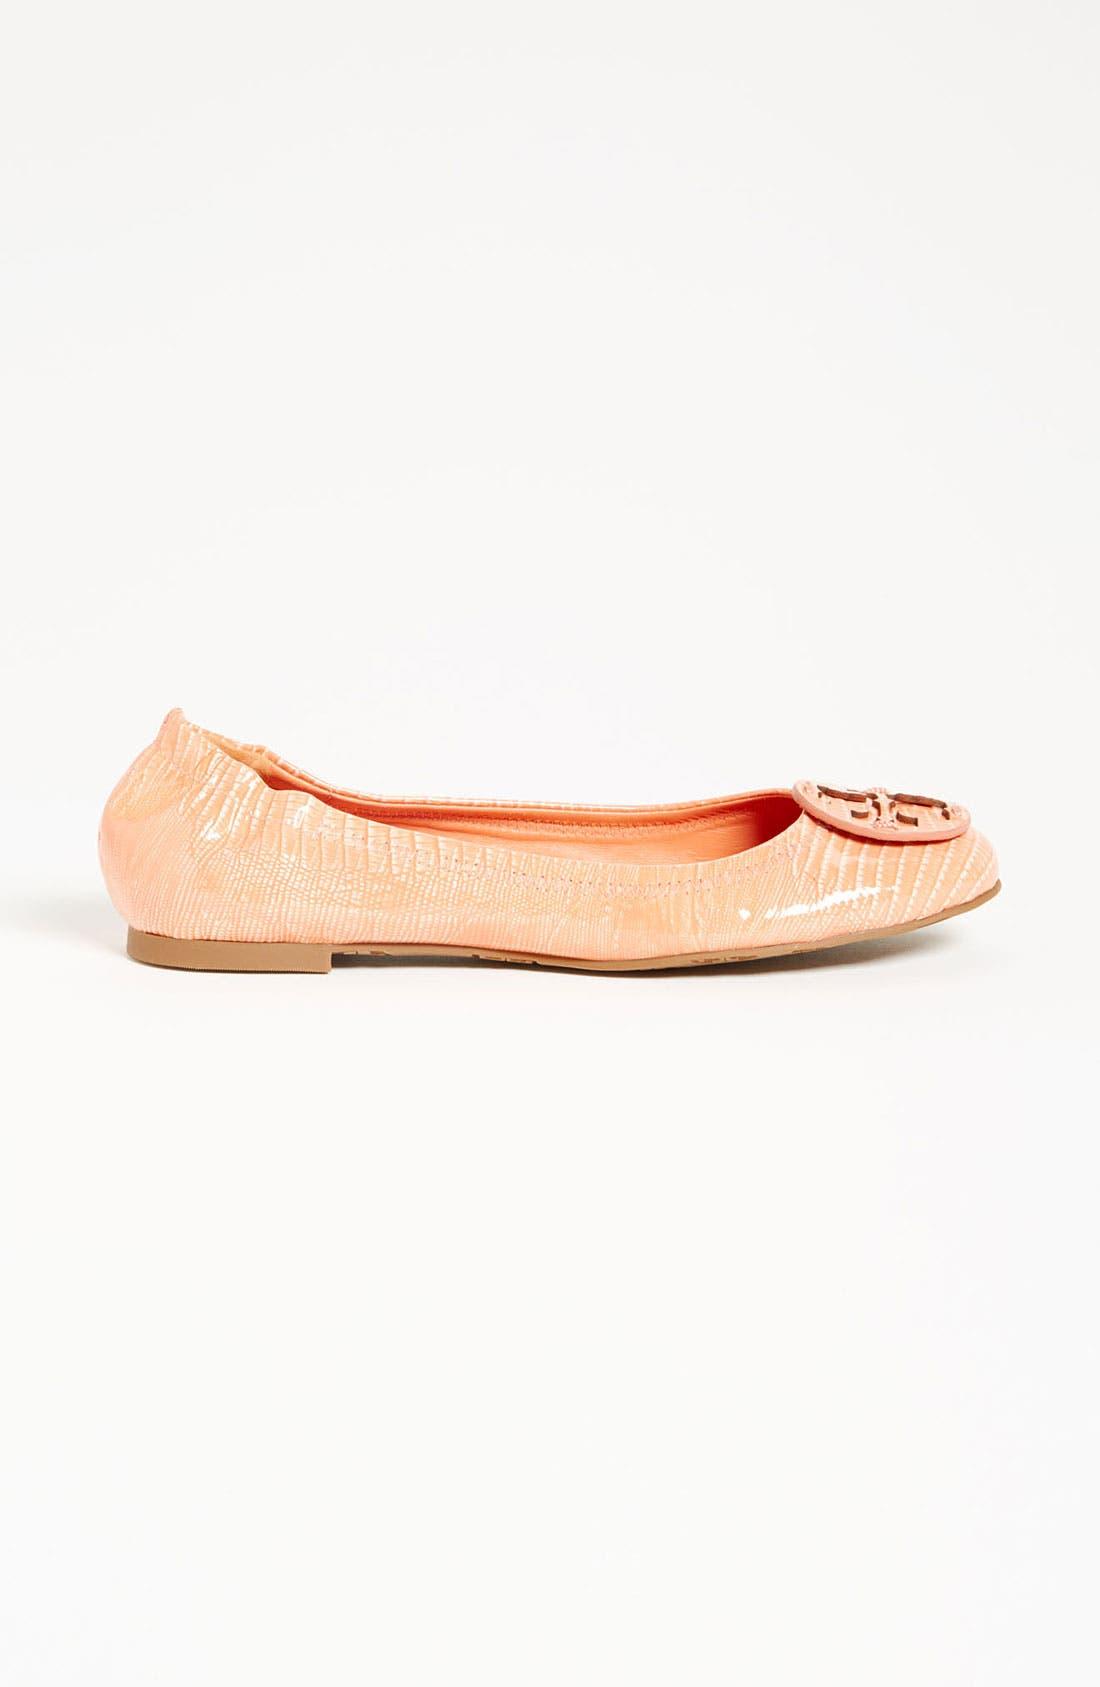 'Reva' Ballerina Flat, Main, color, 001